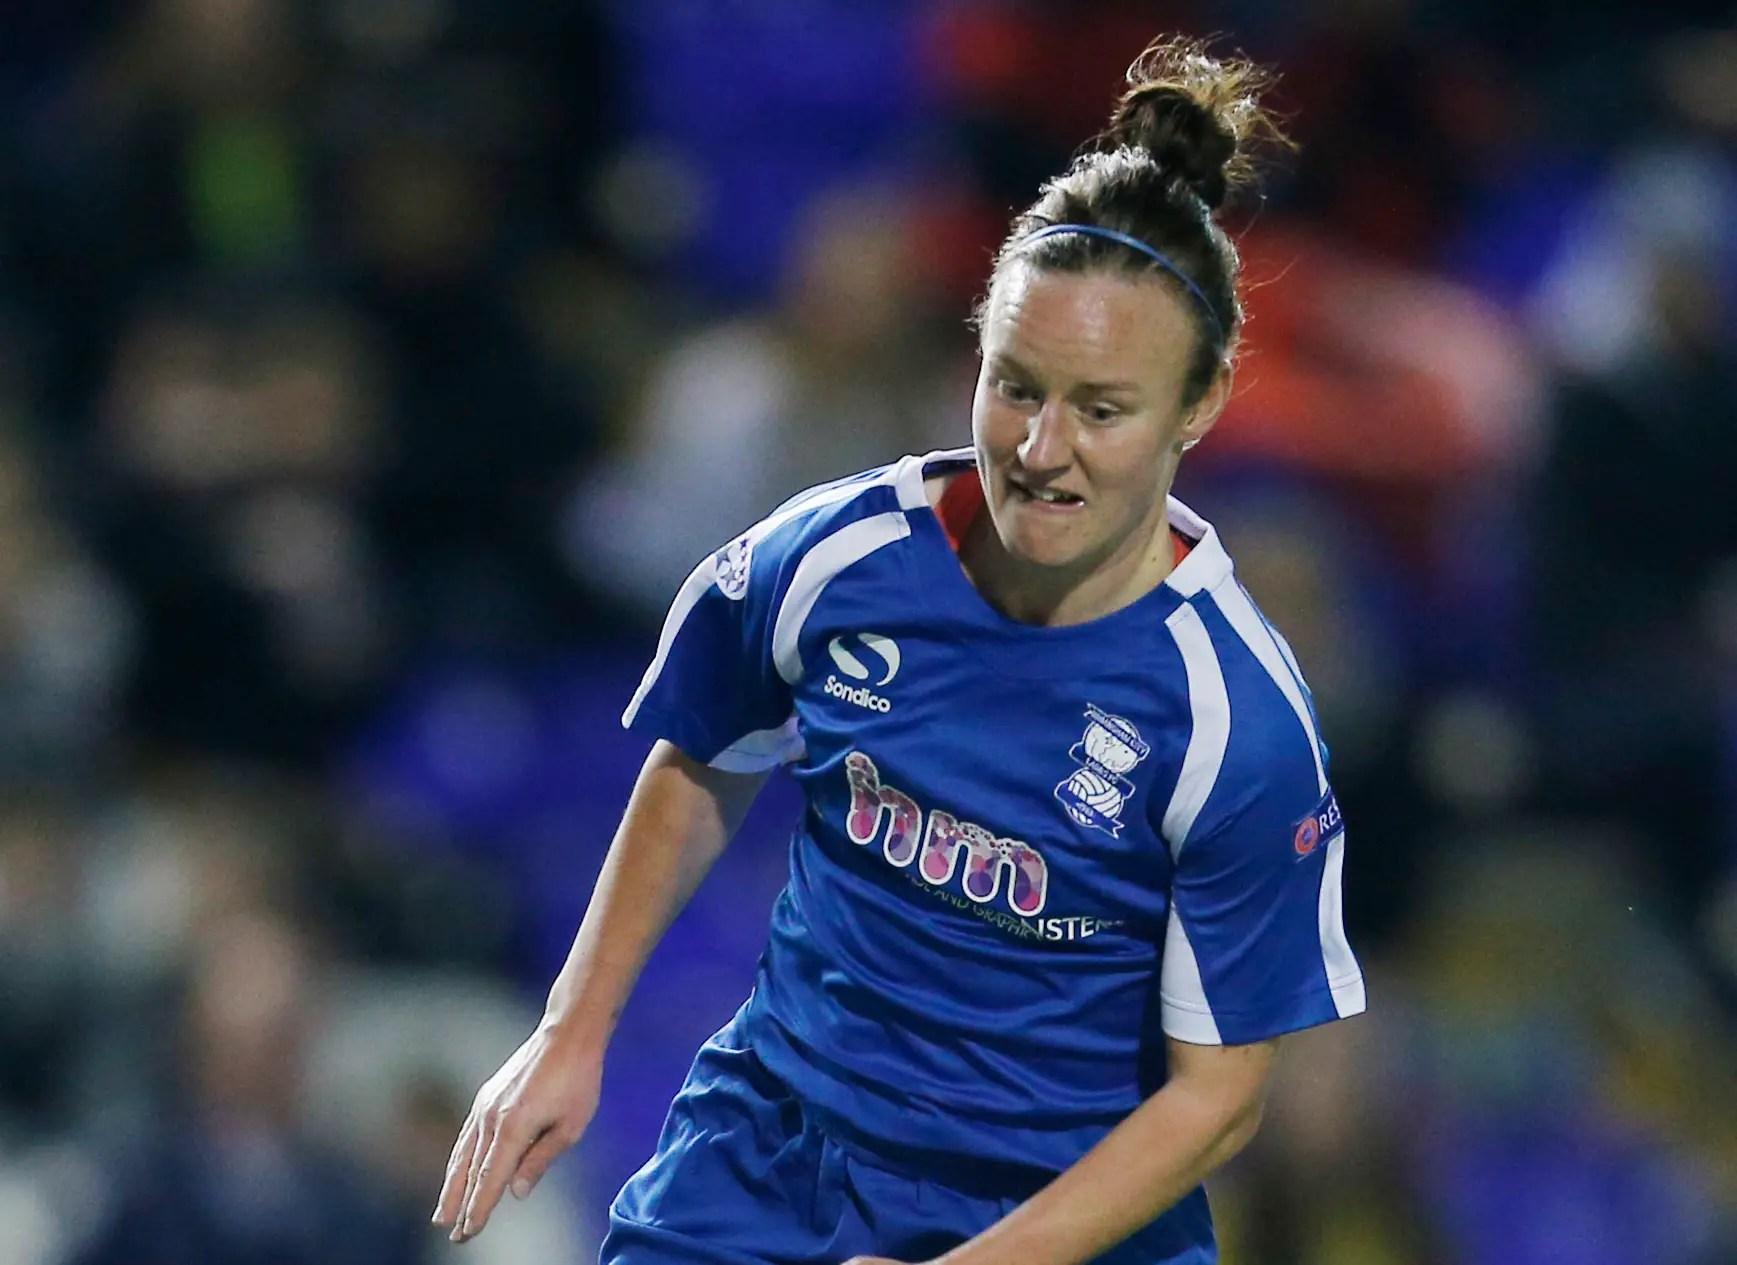 Reading FC Women deadline day signing is midfielder Remi Allen